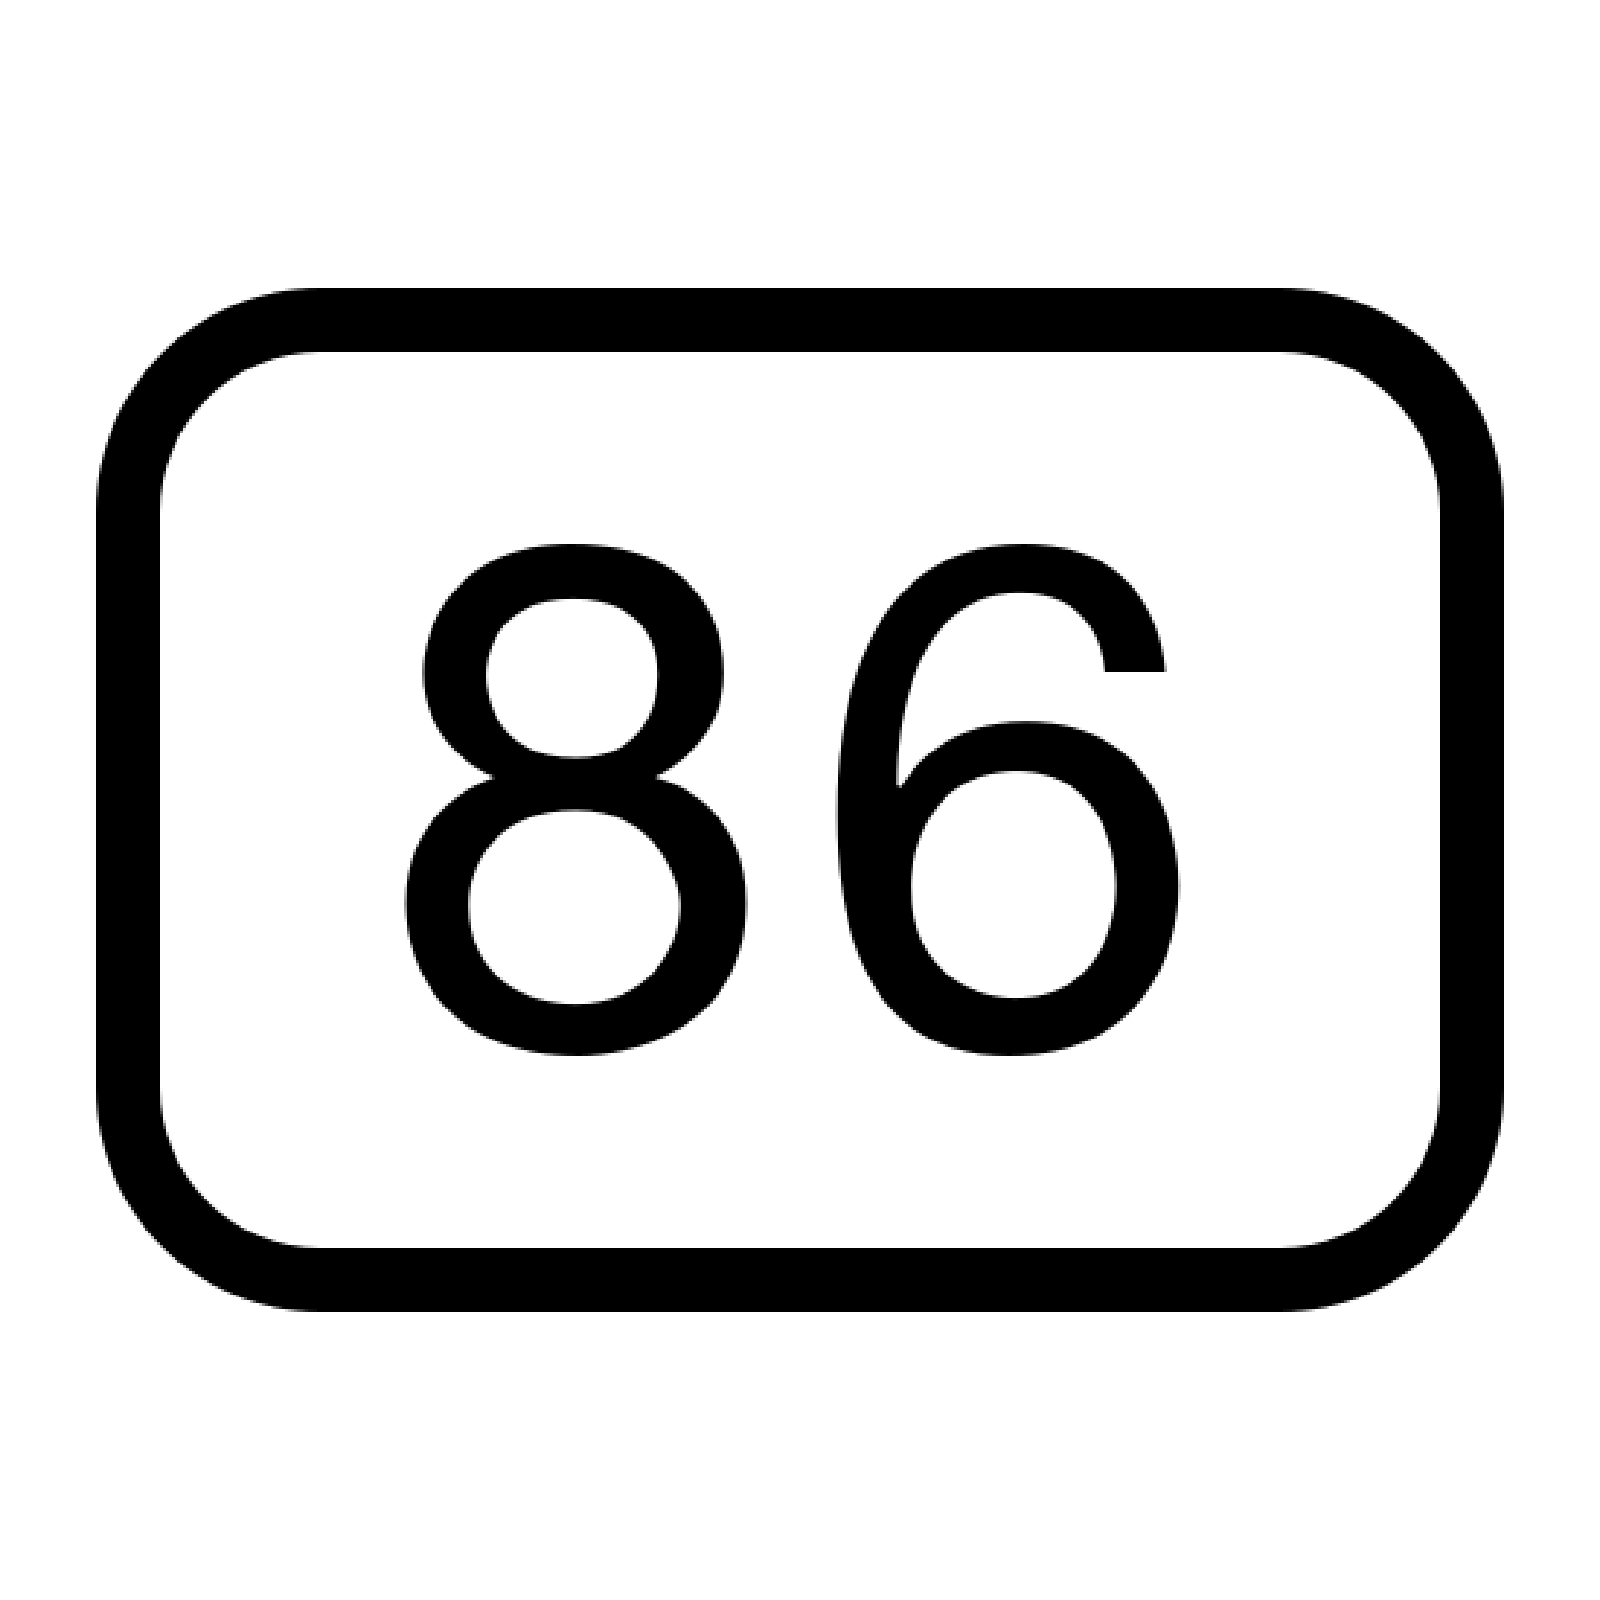 86 icon